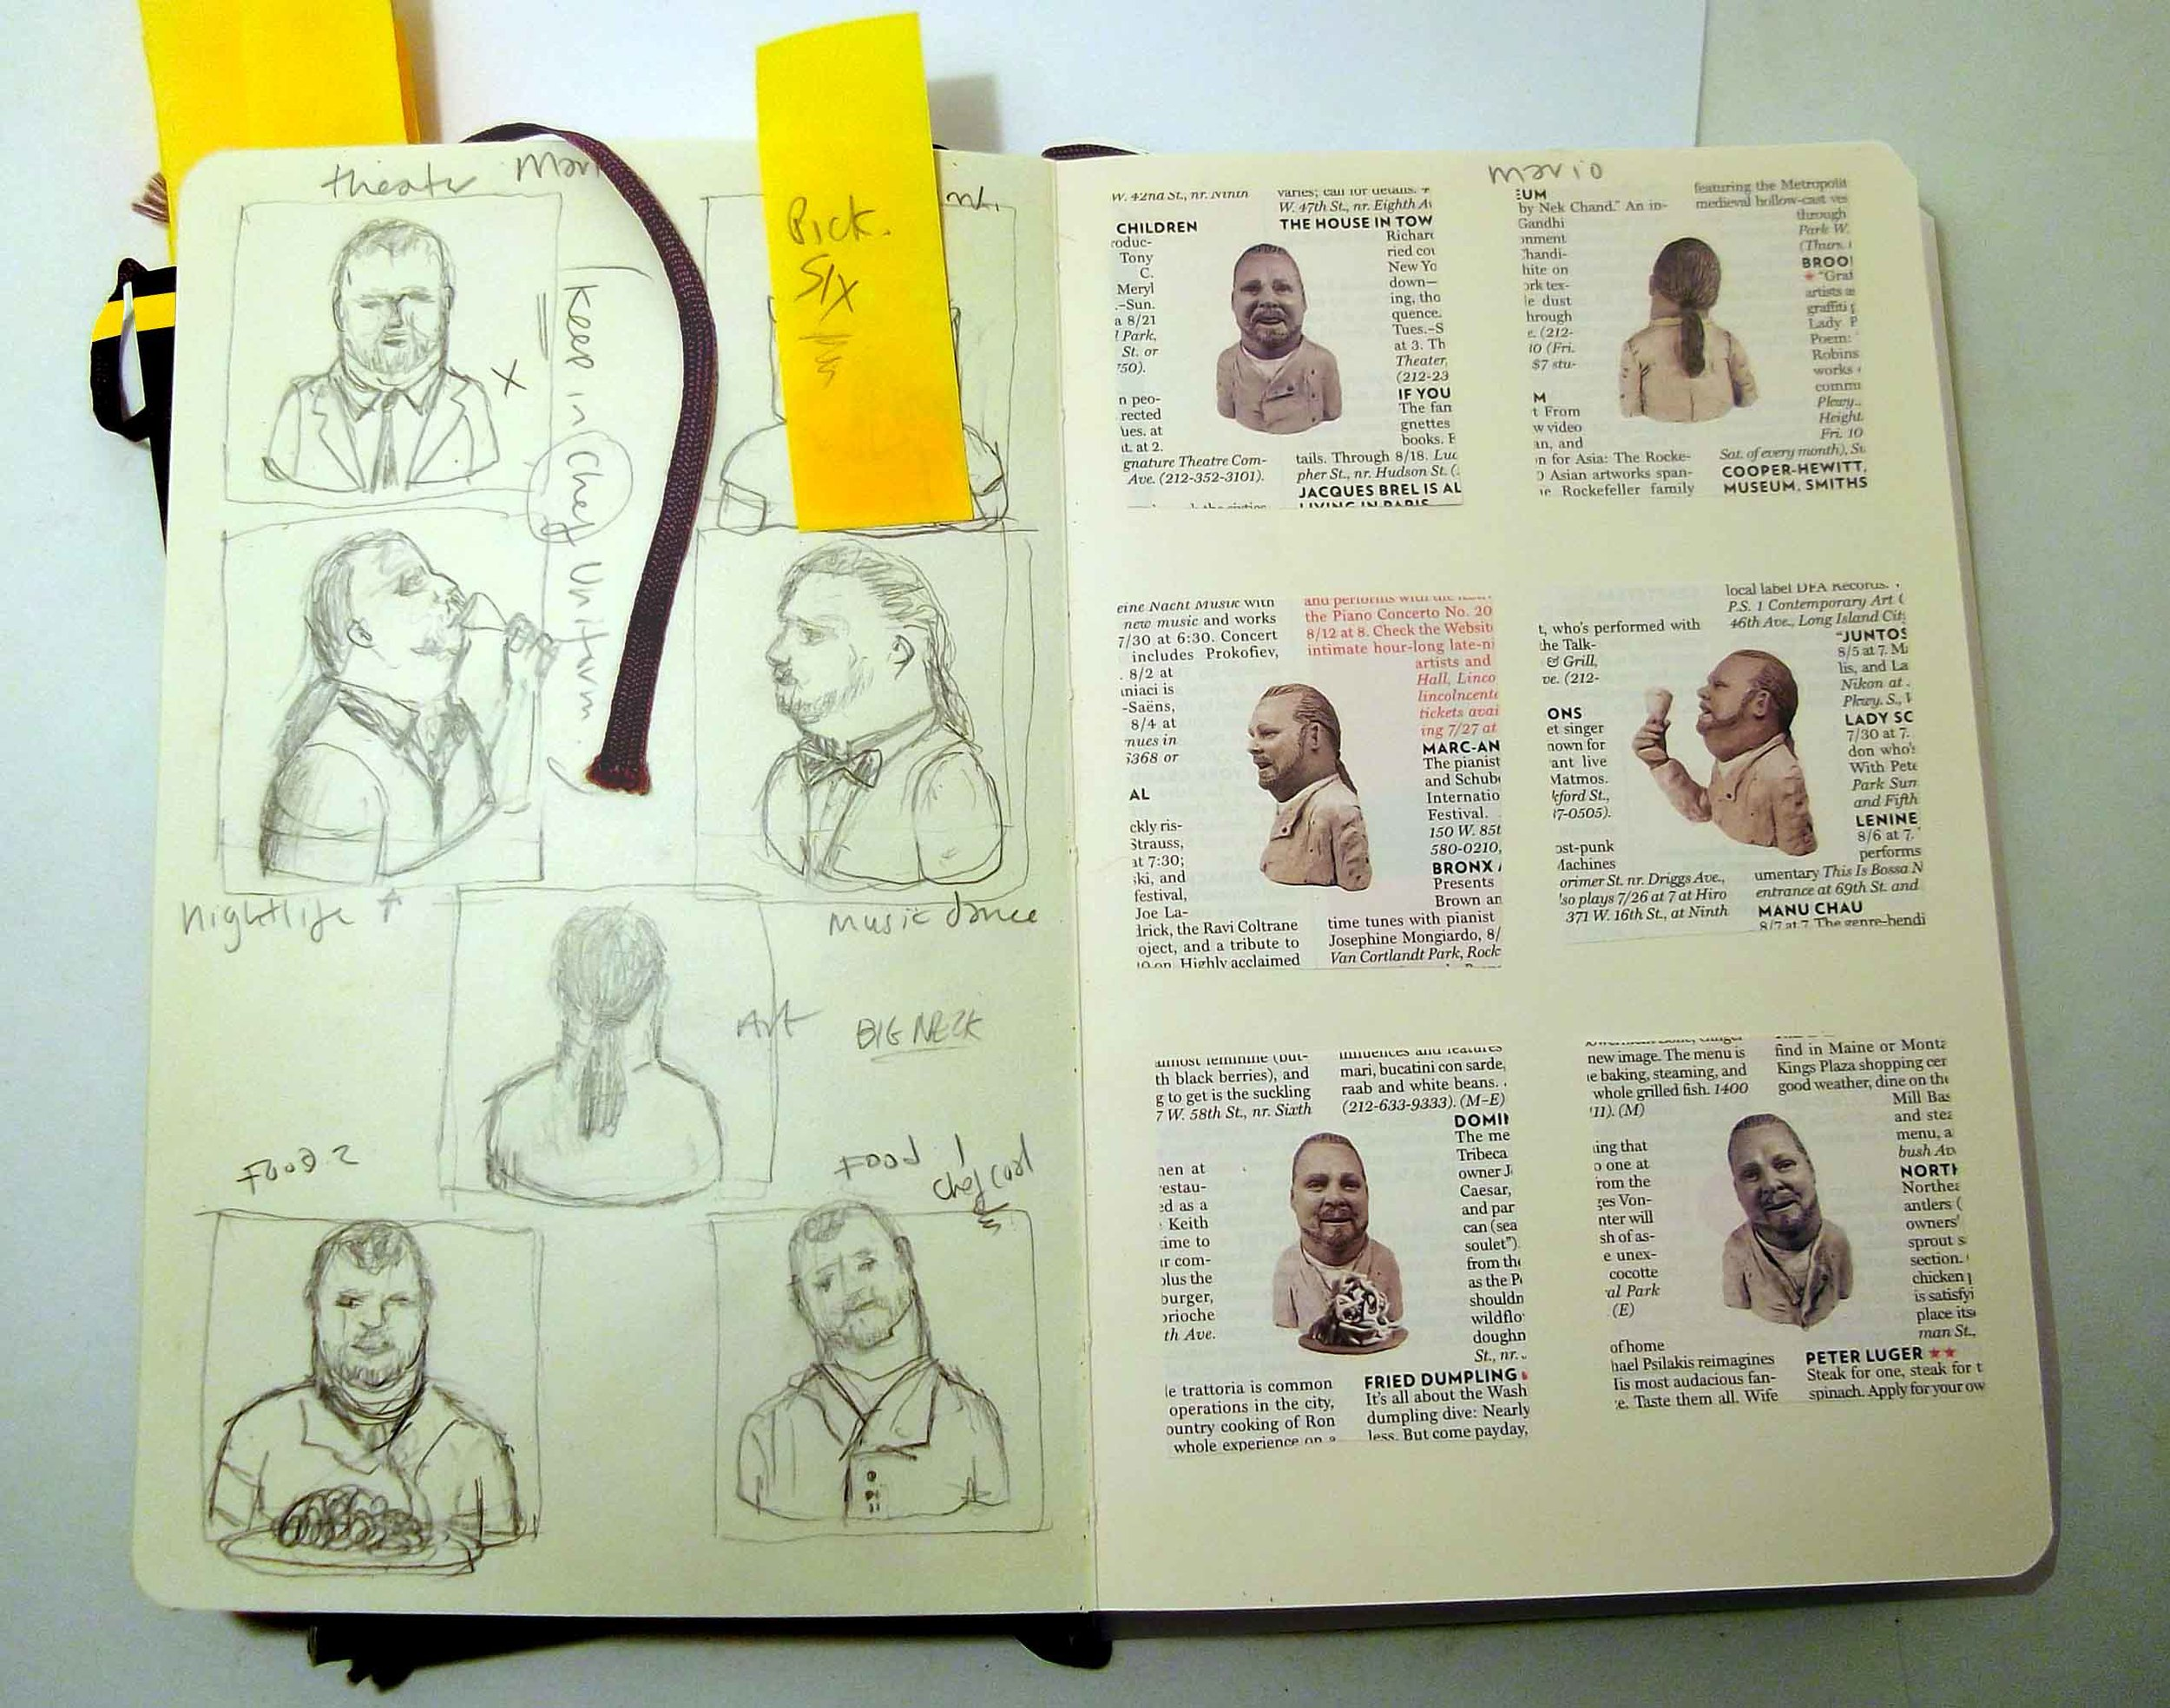 Mario Batali sketches and in print (New York Magazine)